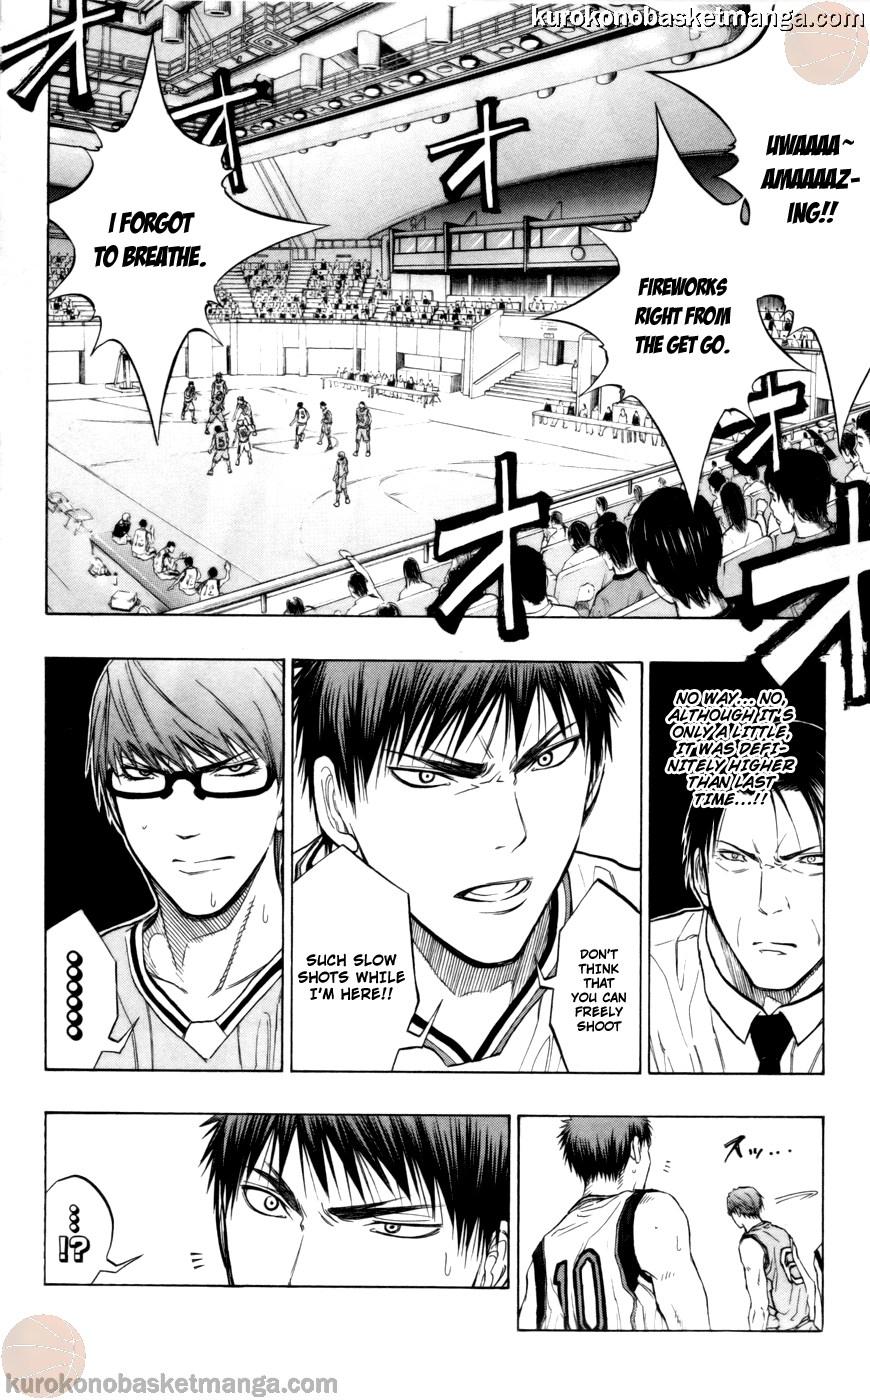 Kuroko no Basket Manga Chapter 86 - Image 14